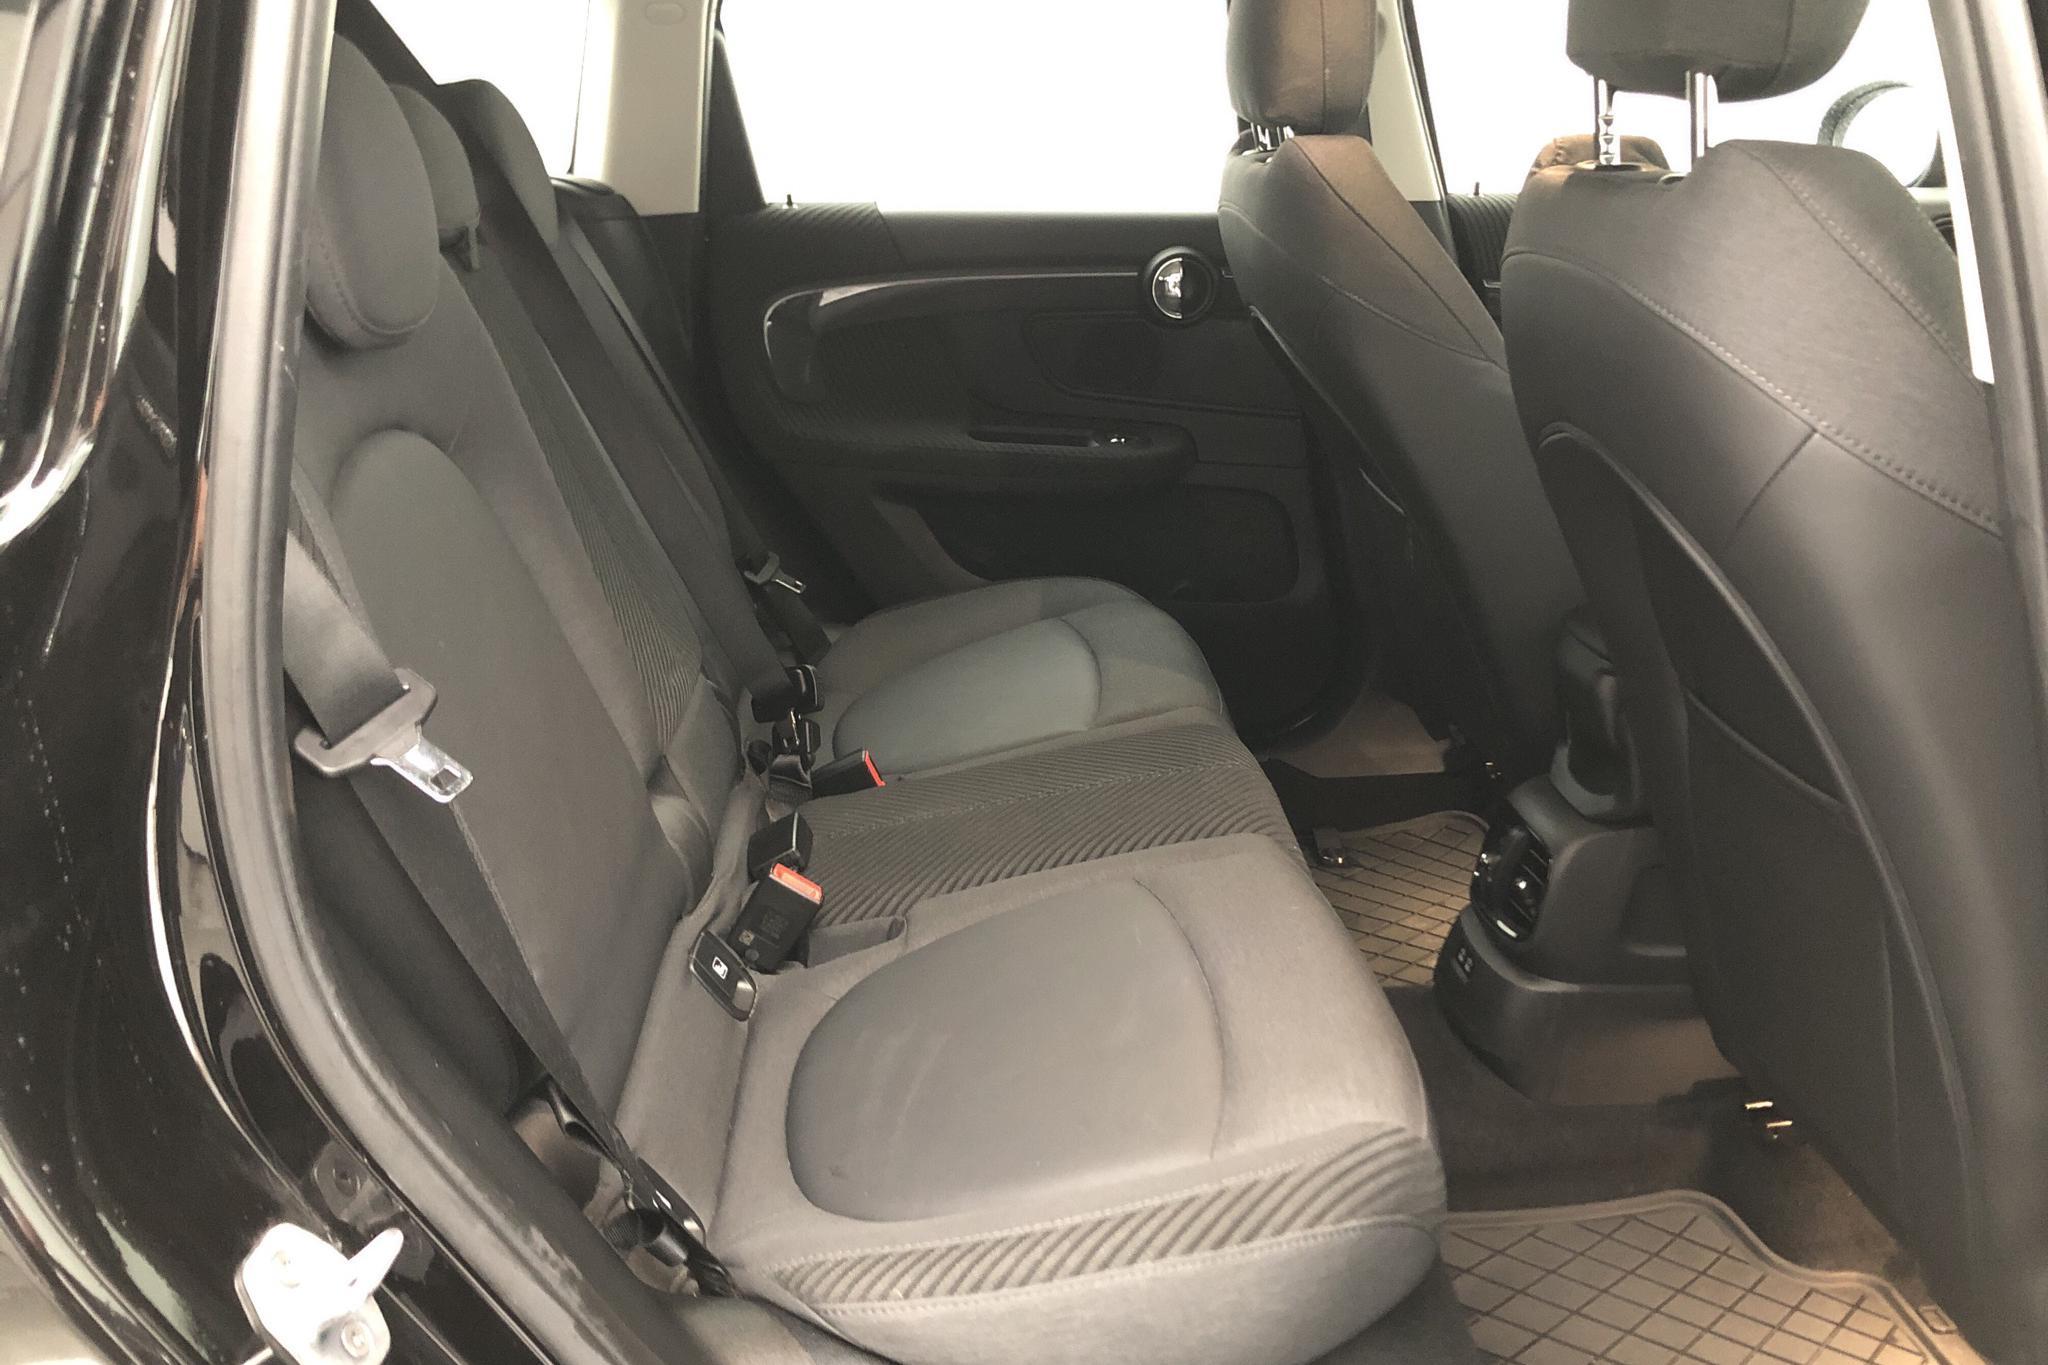 MINI Cooper S E ALL4 Countryman, F60 (224hk) - 2 261 mil - Automat - svart - 2019